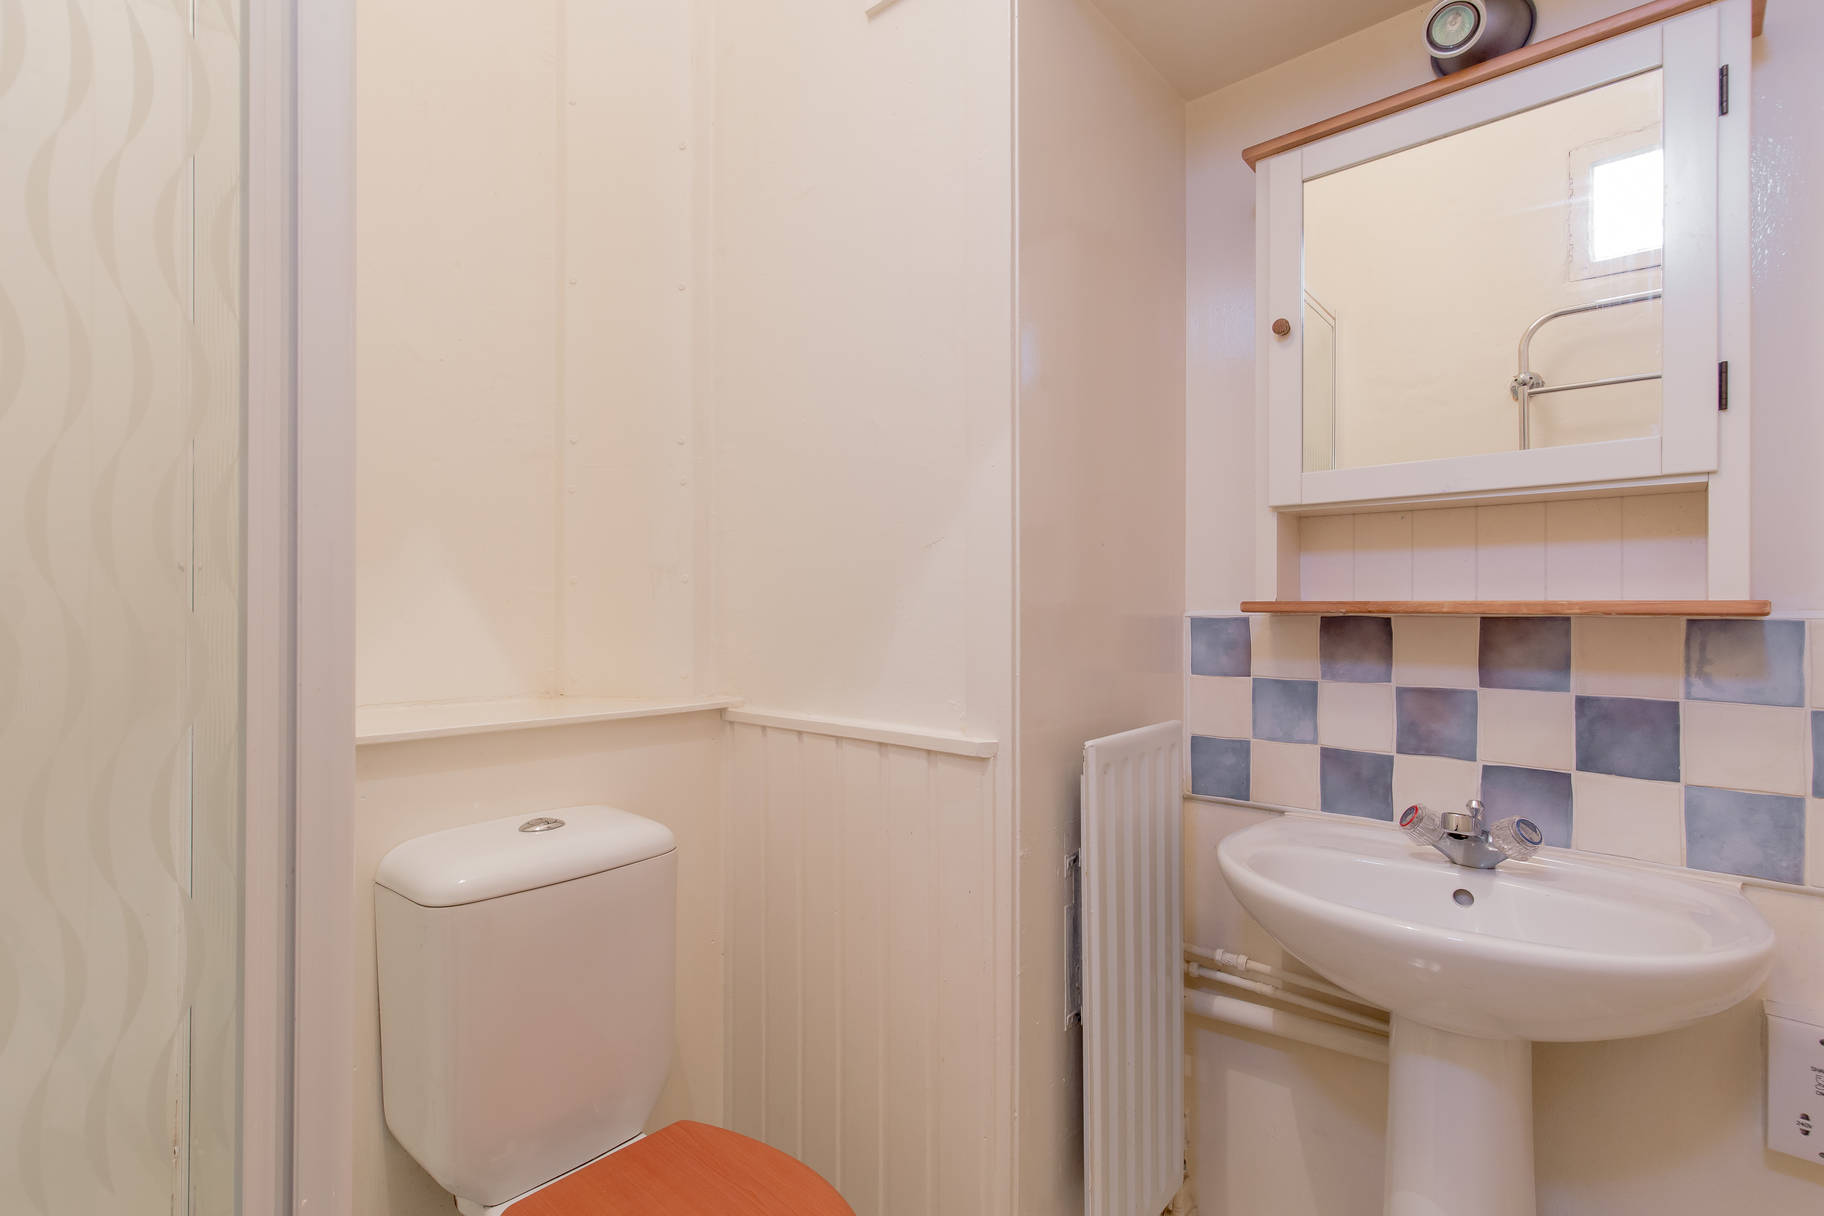 21 (3F1) Brougham Place, Tollcross, Edinburgh, EH3 9JU